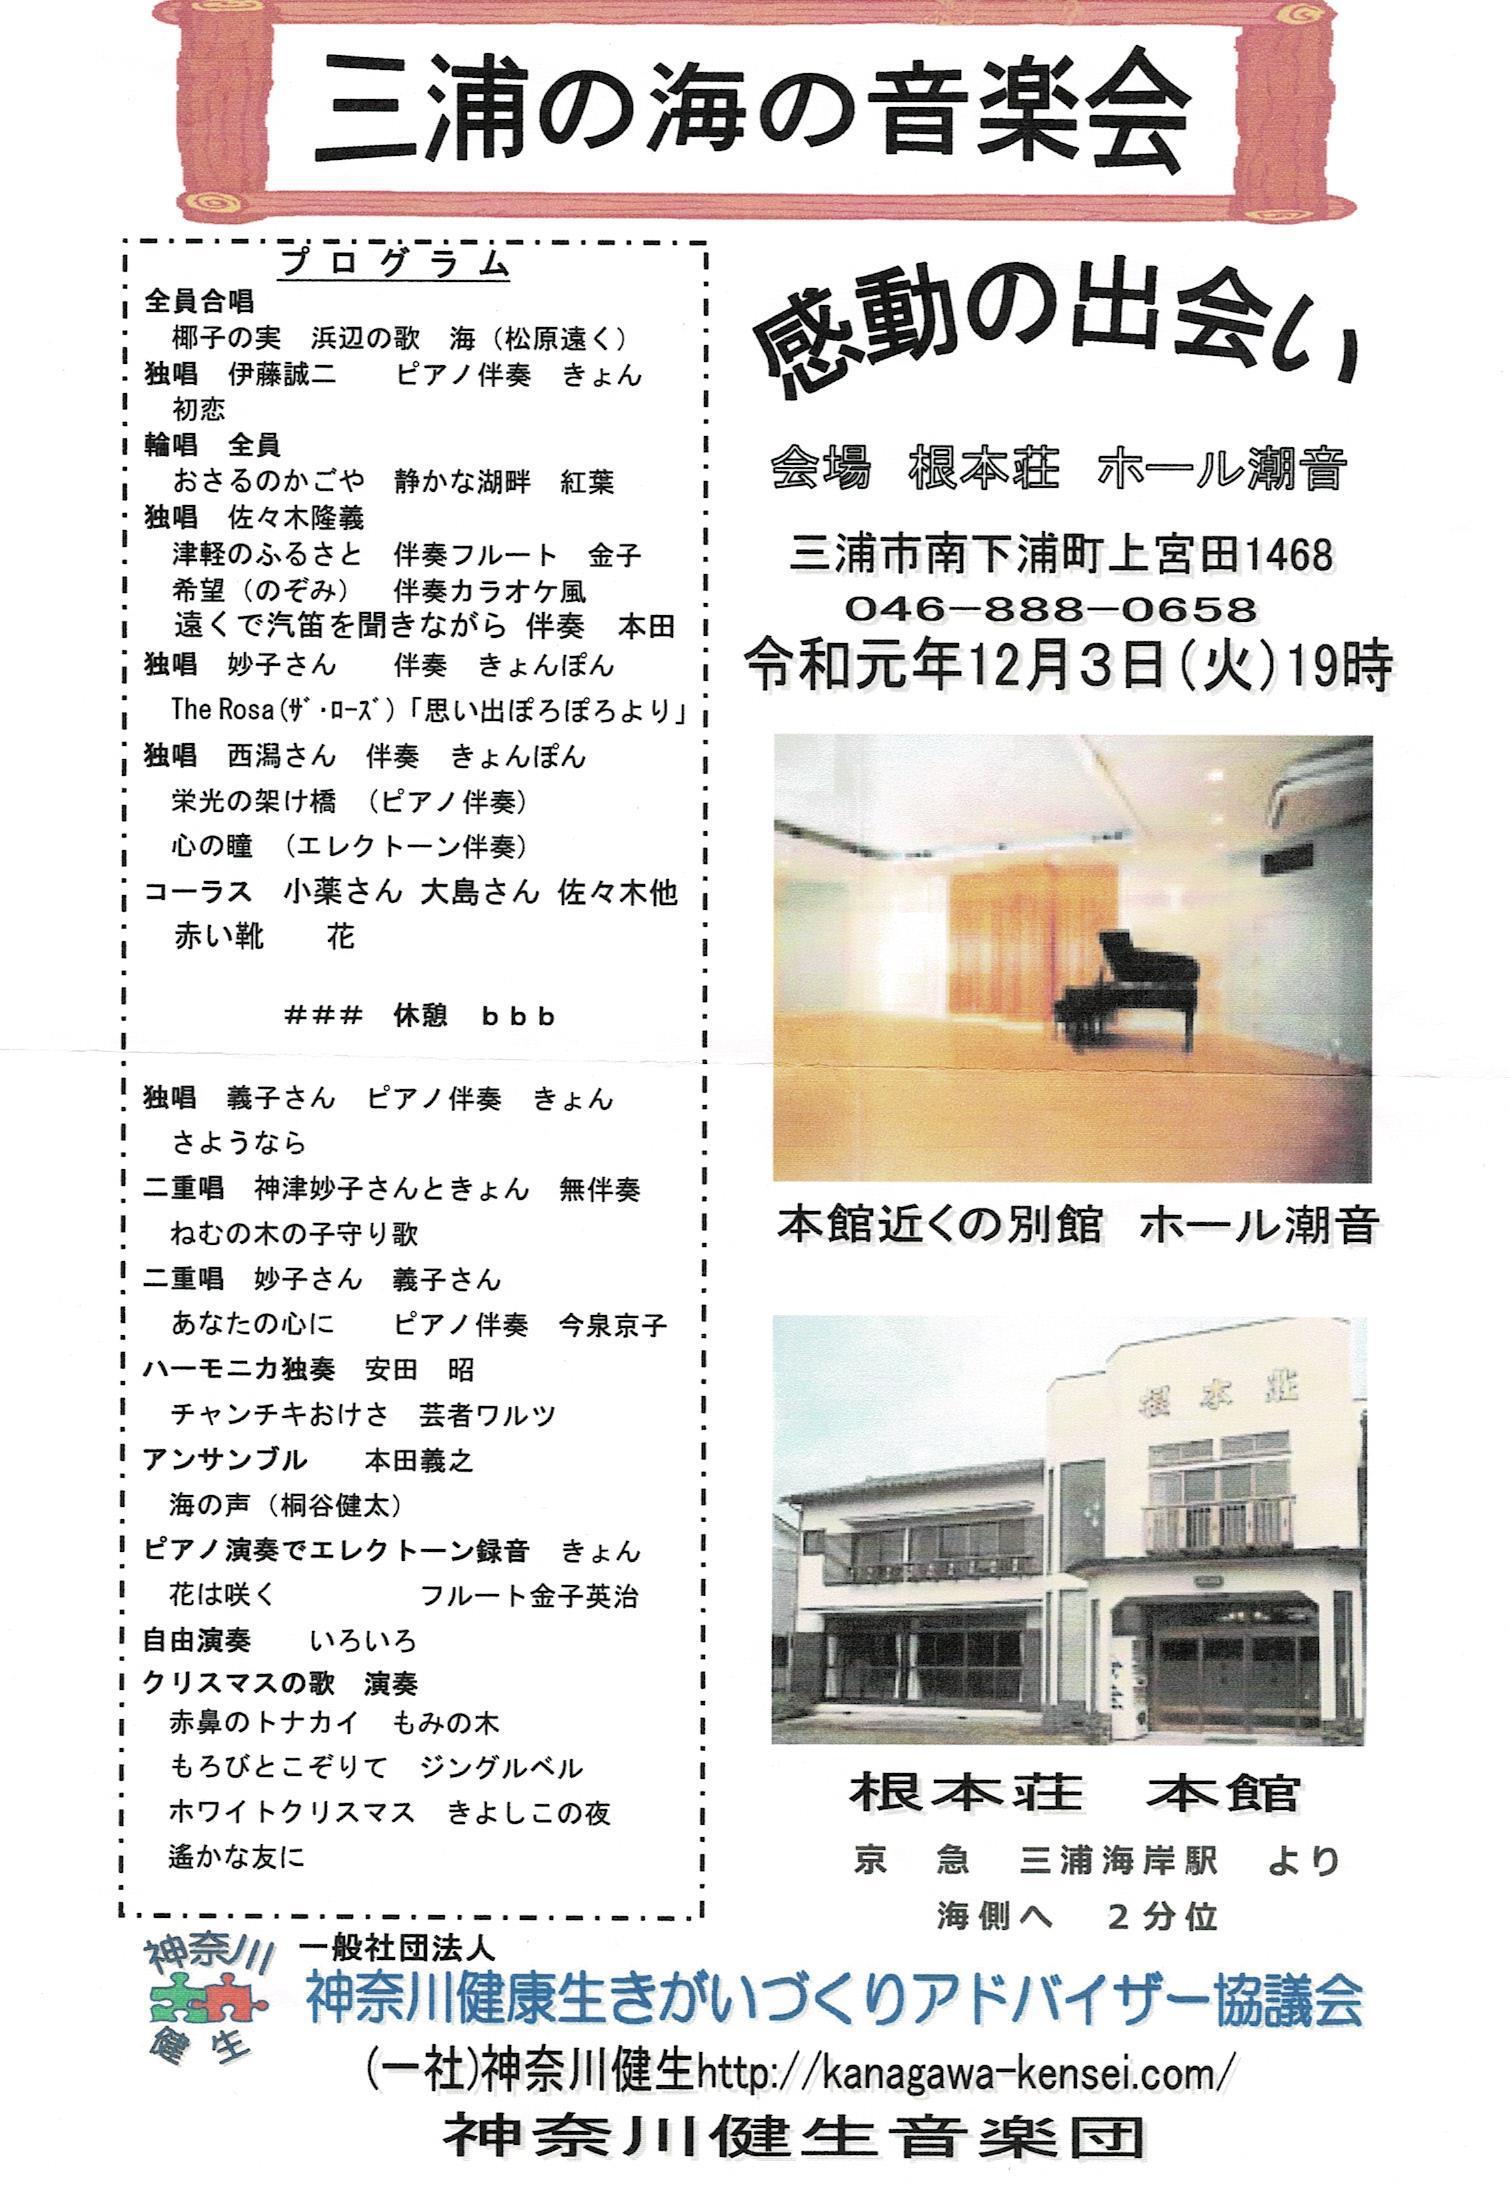 三浦の海の音楽会・合宿懇親 2019-12-3,4_e0221892_15331986.jpg